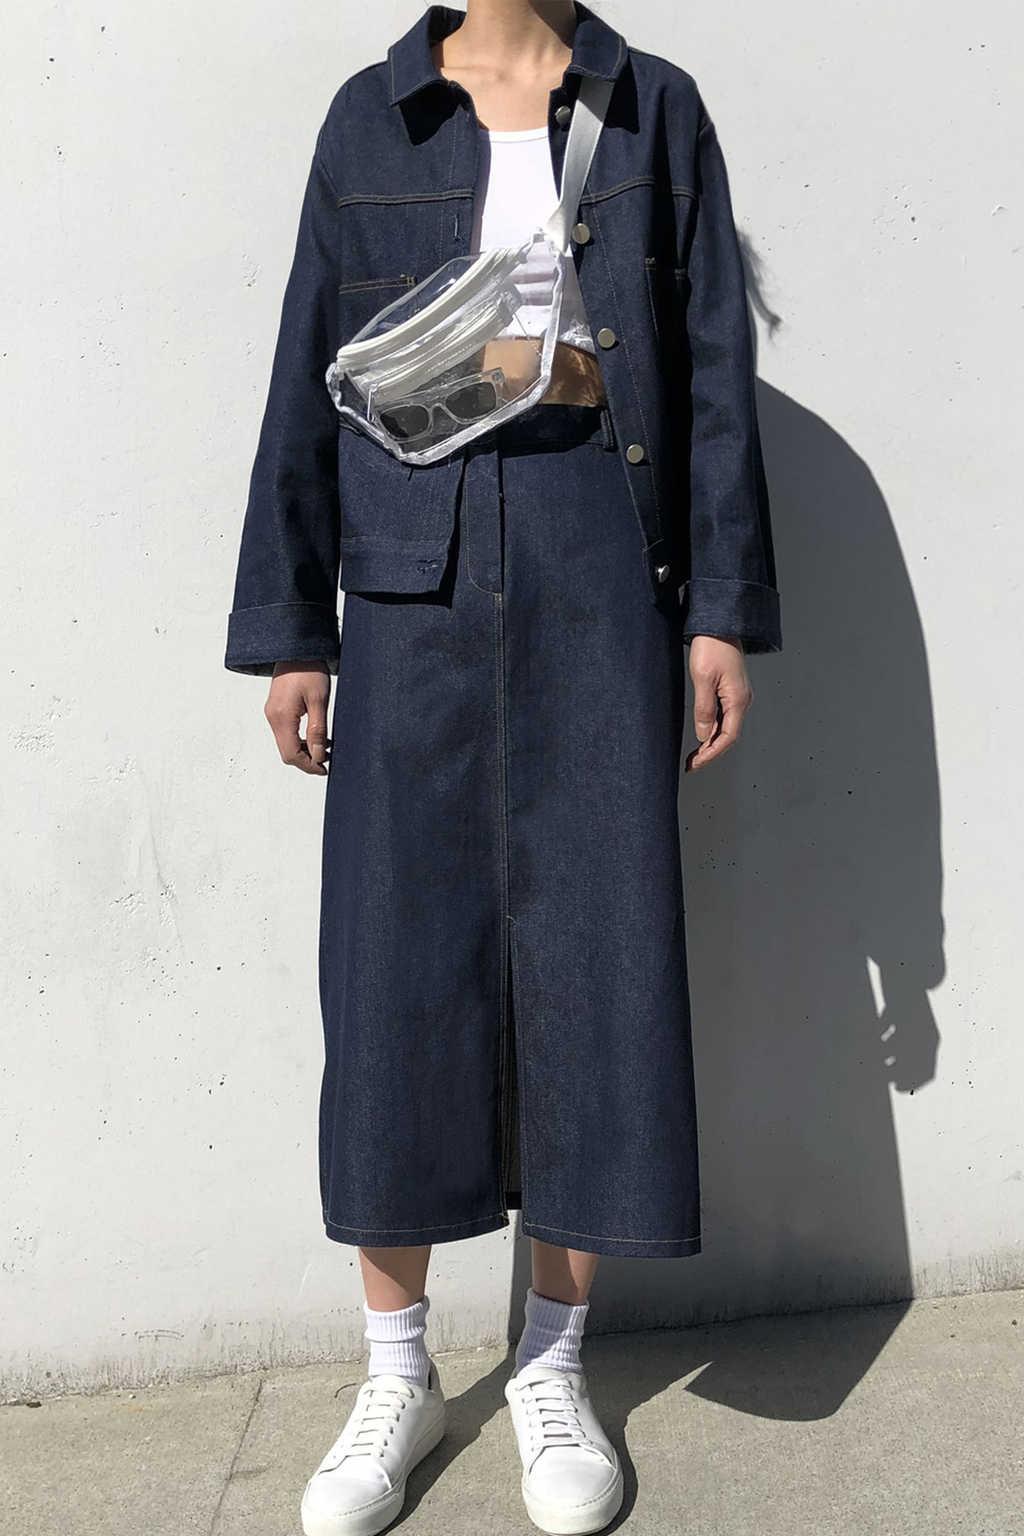 Clear Waist Bag 3311 Clear 2